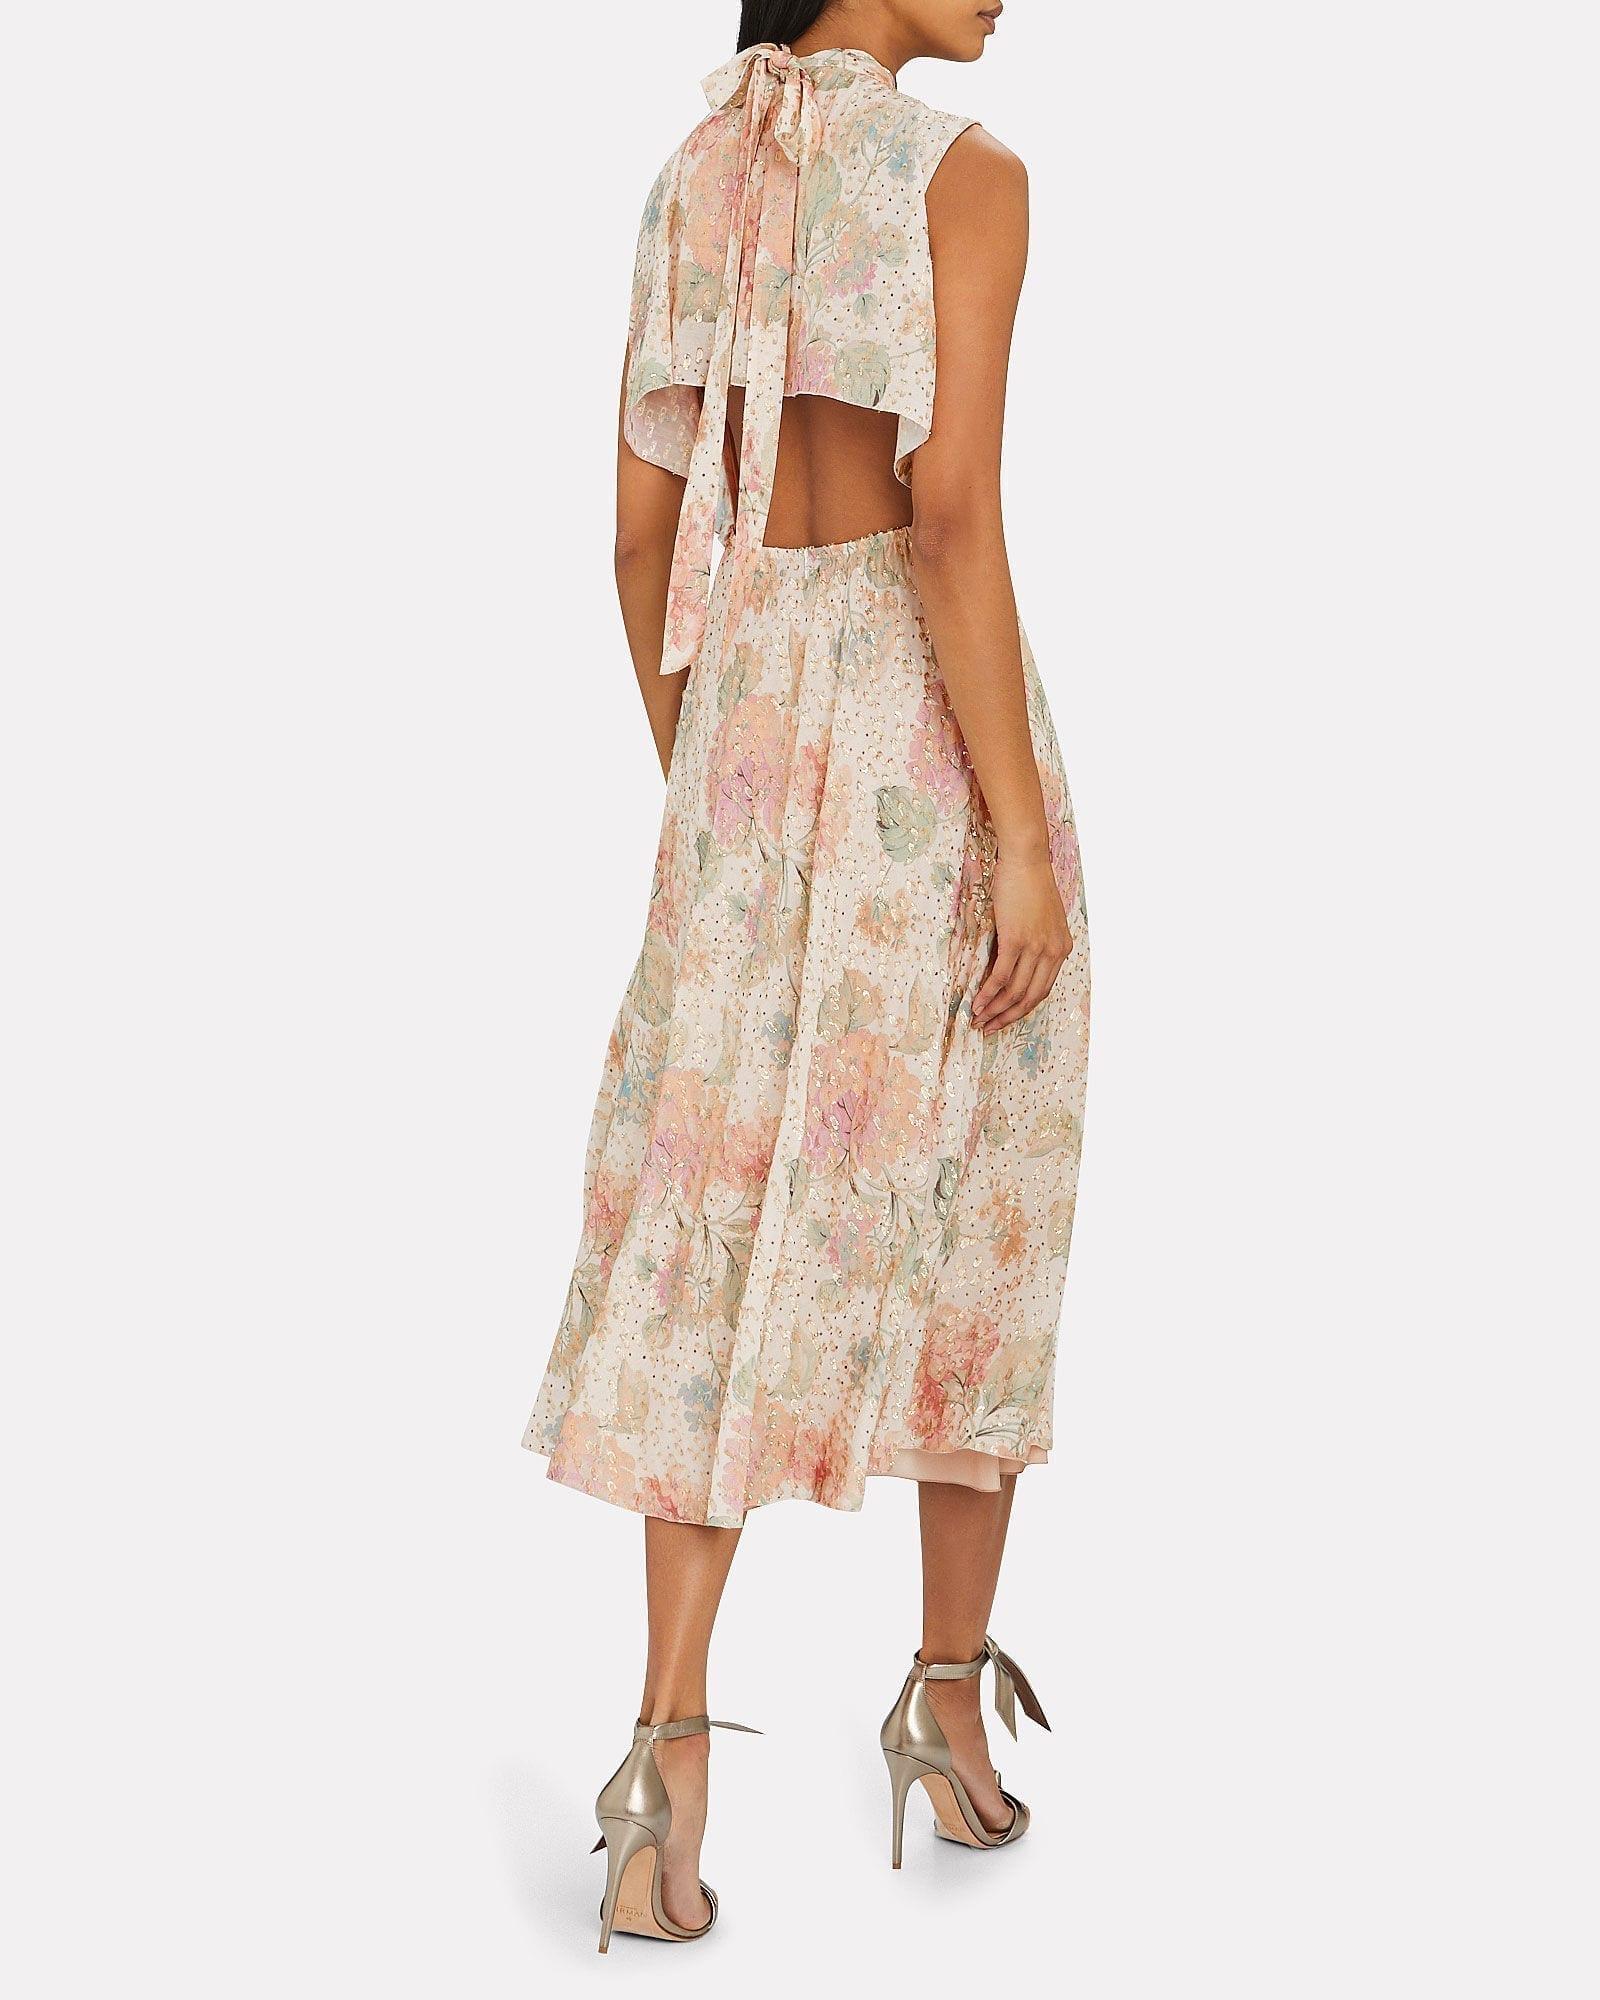 REDVALENTINO Lurex Floral Midi Dress